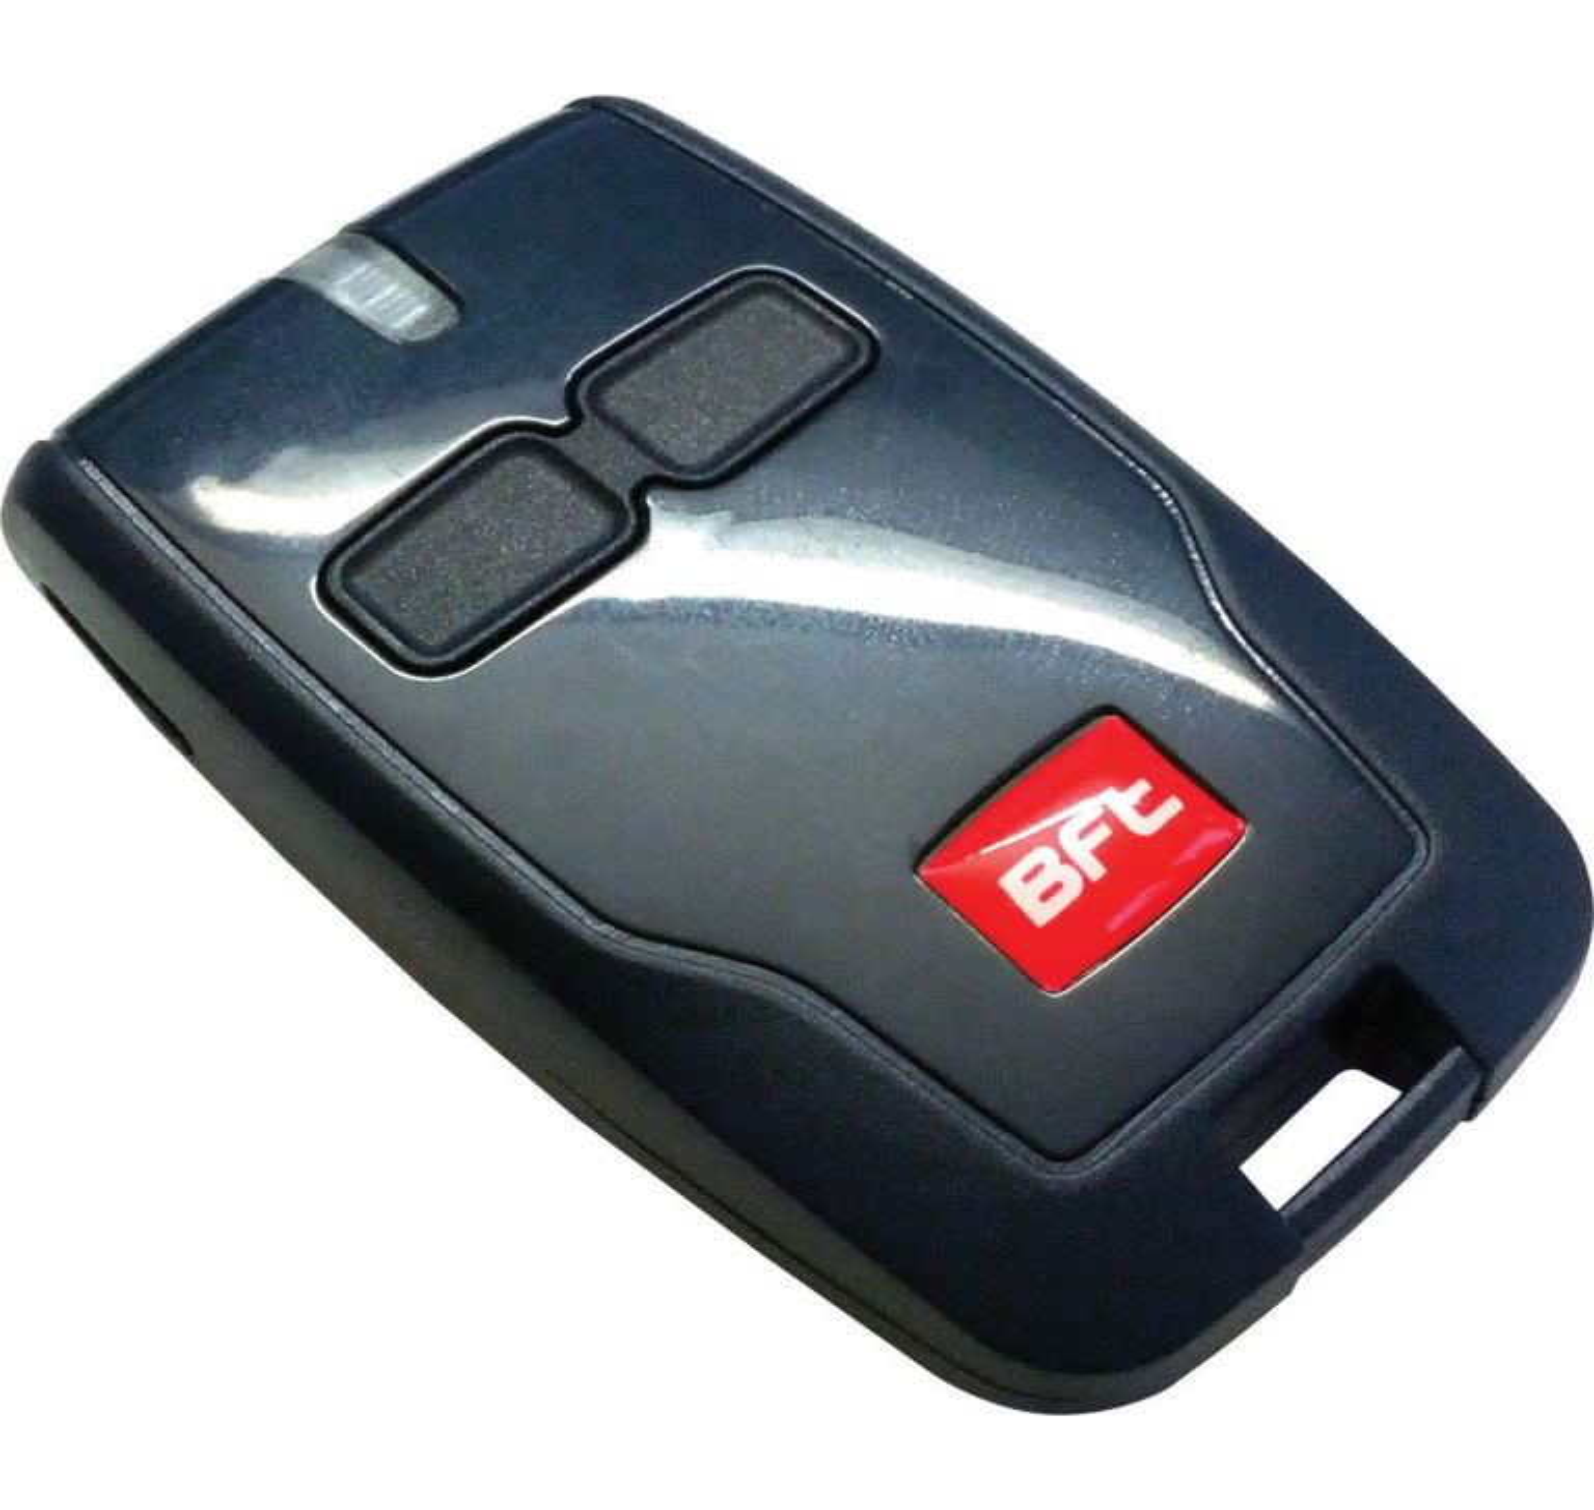 Handzender BFT MITTO B RCB 12v met 2 kanalen